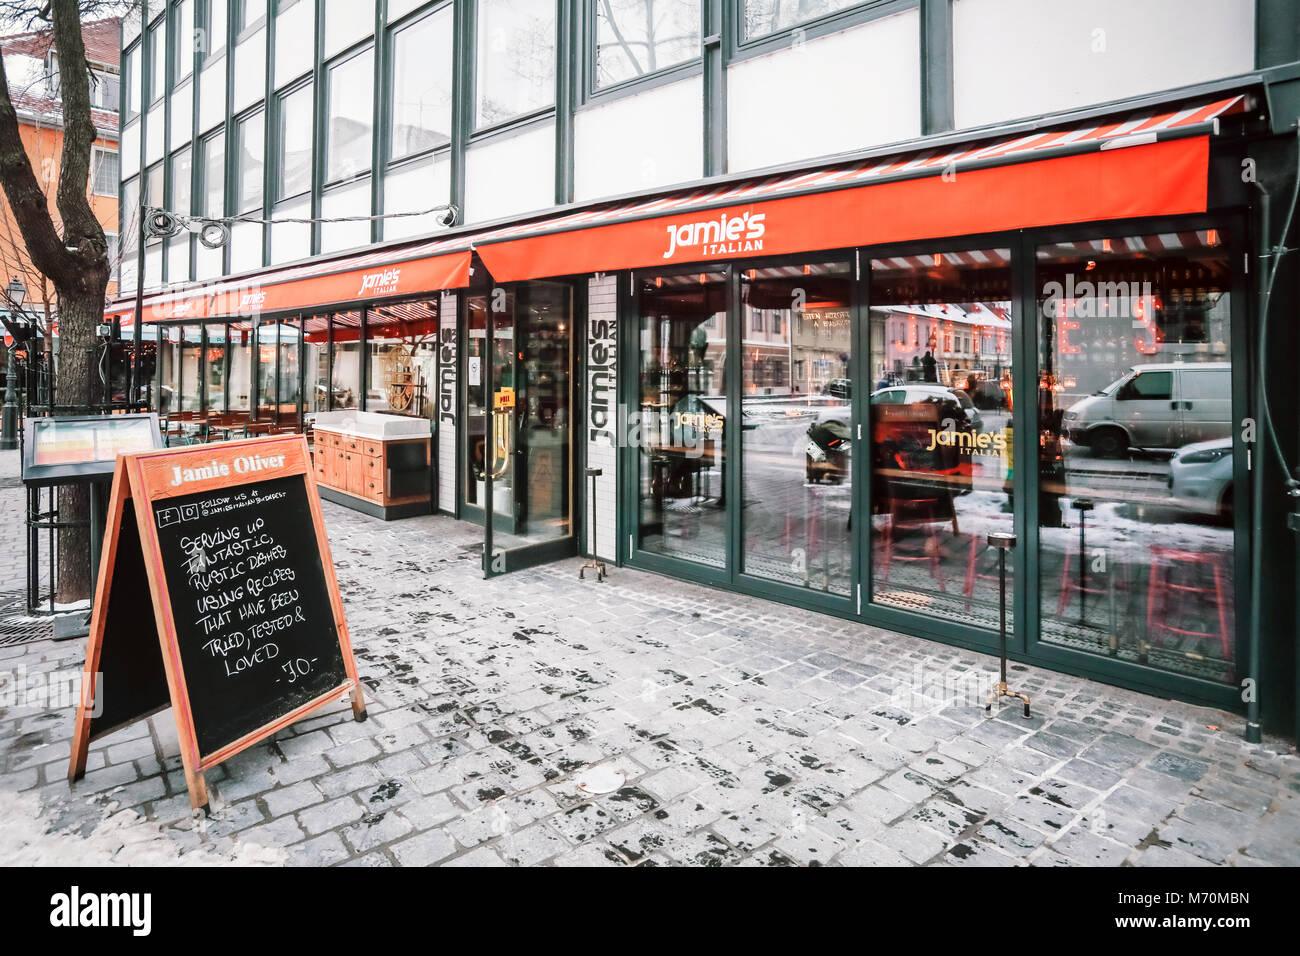 Jamies Italian Restaurant In Budapest Hungary Exterior In Stock